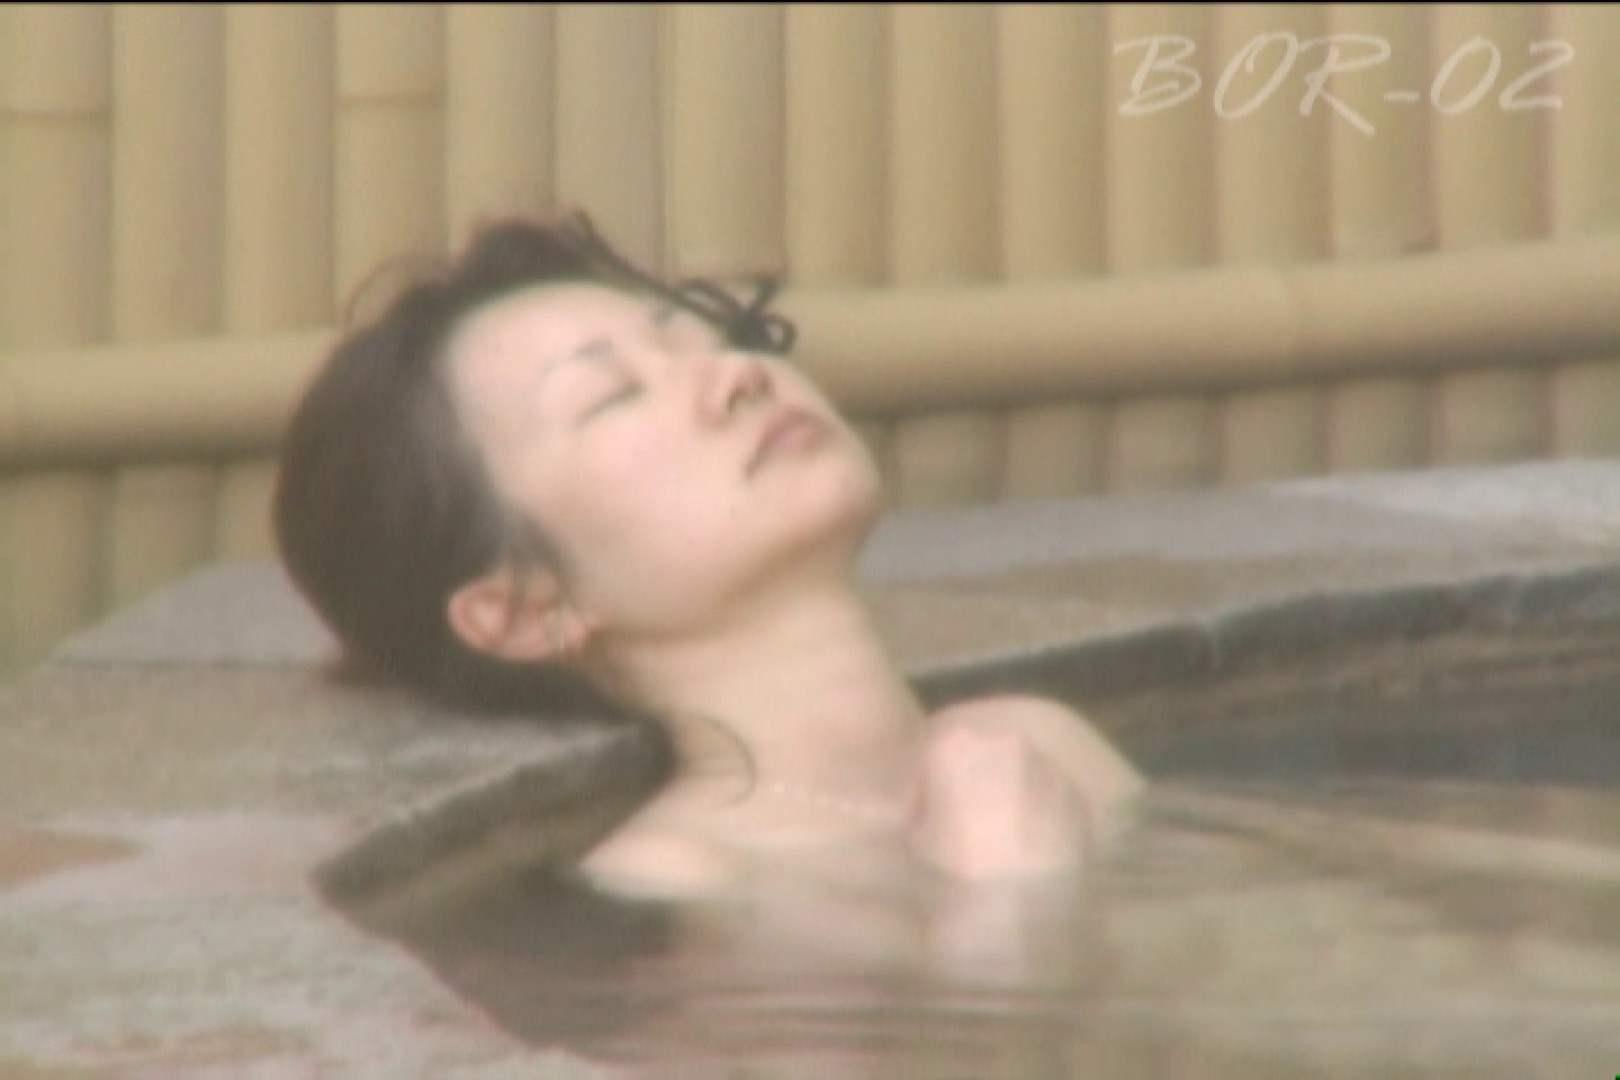 Aquaな露天風呂Vol.477 盗撮   OLエロ画像  99PICs 49